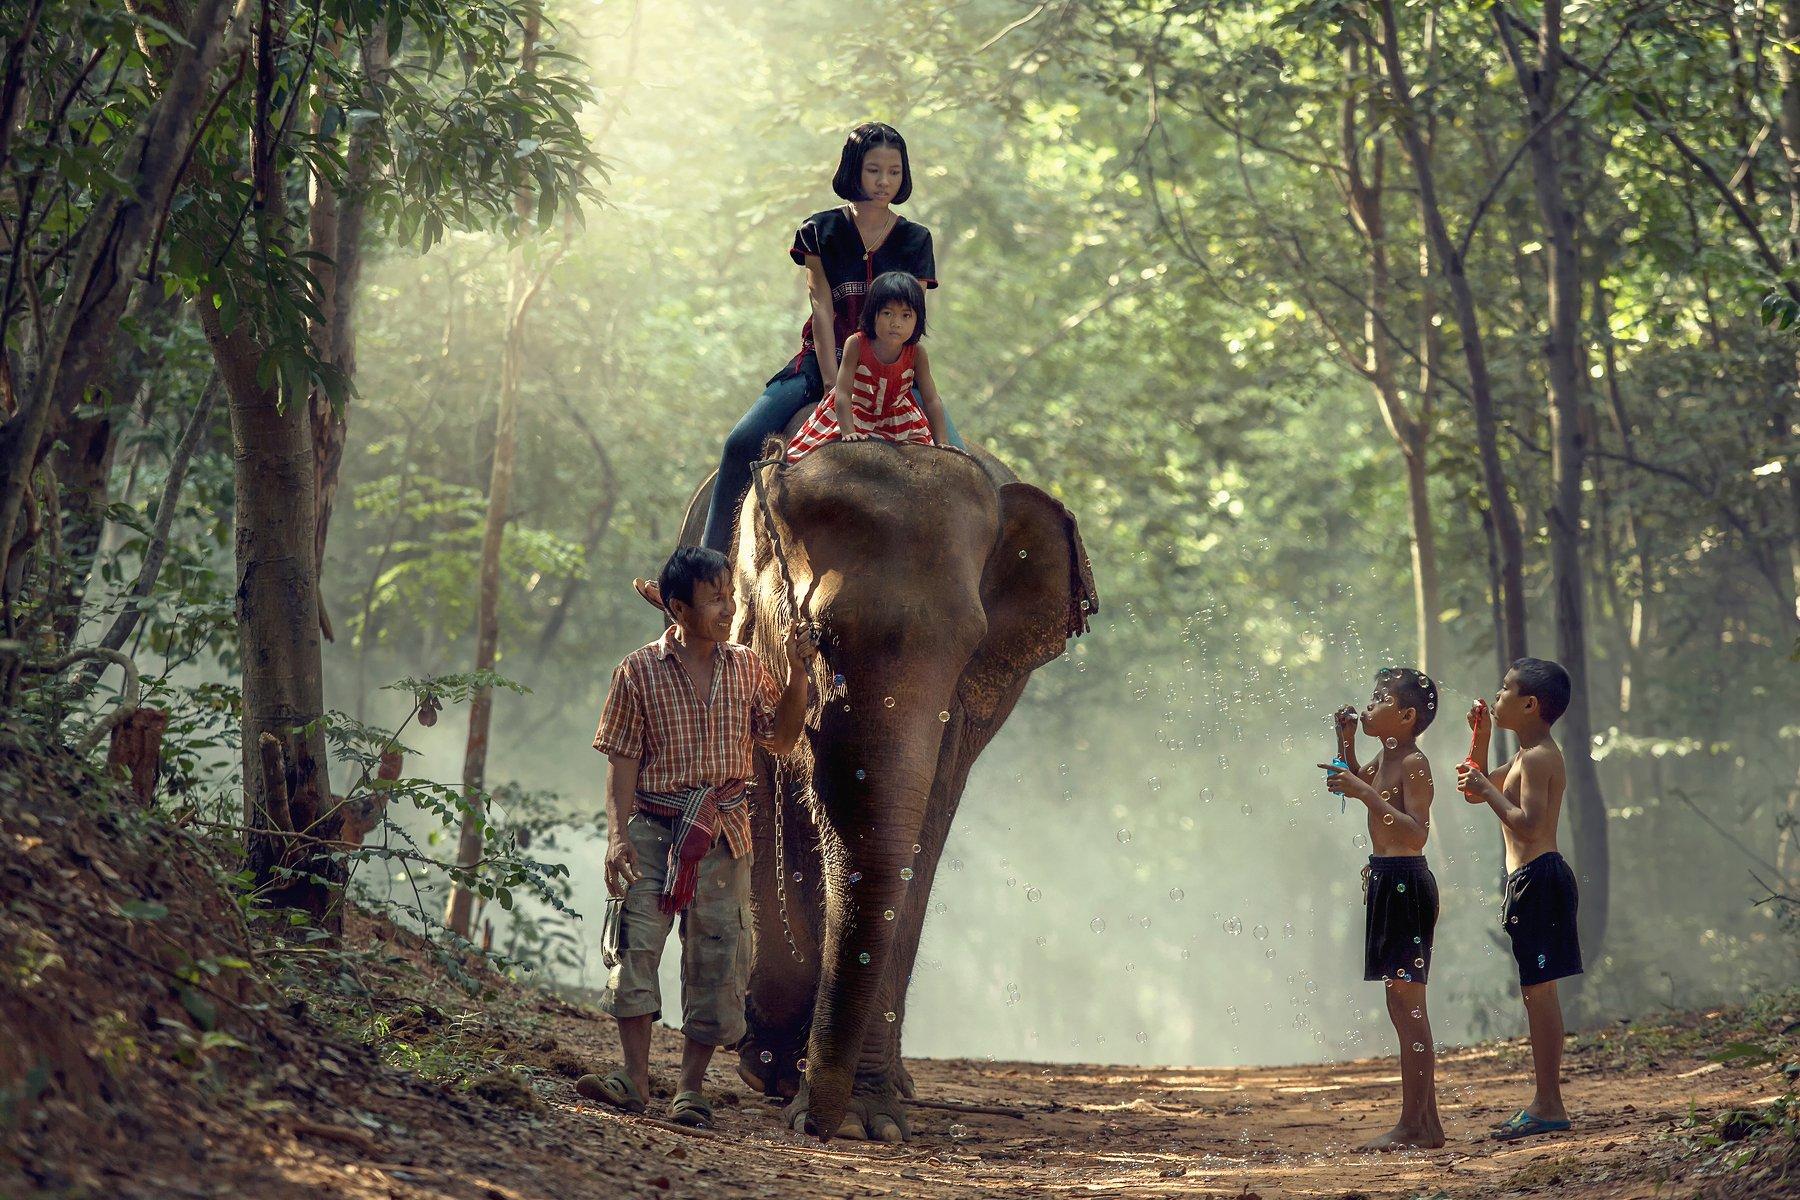 elephant,family,children,girl,boy,life,asia,people,, SUTIPORN SOMNAM